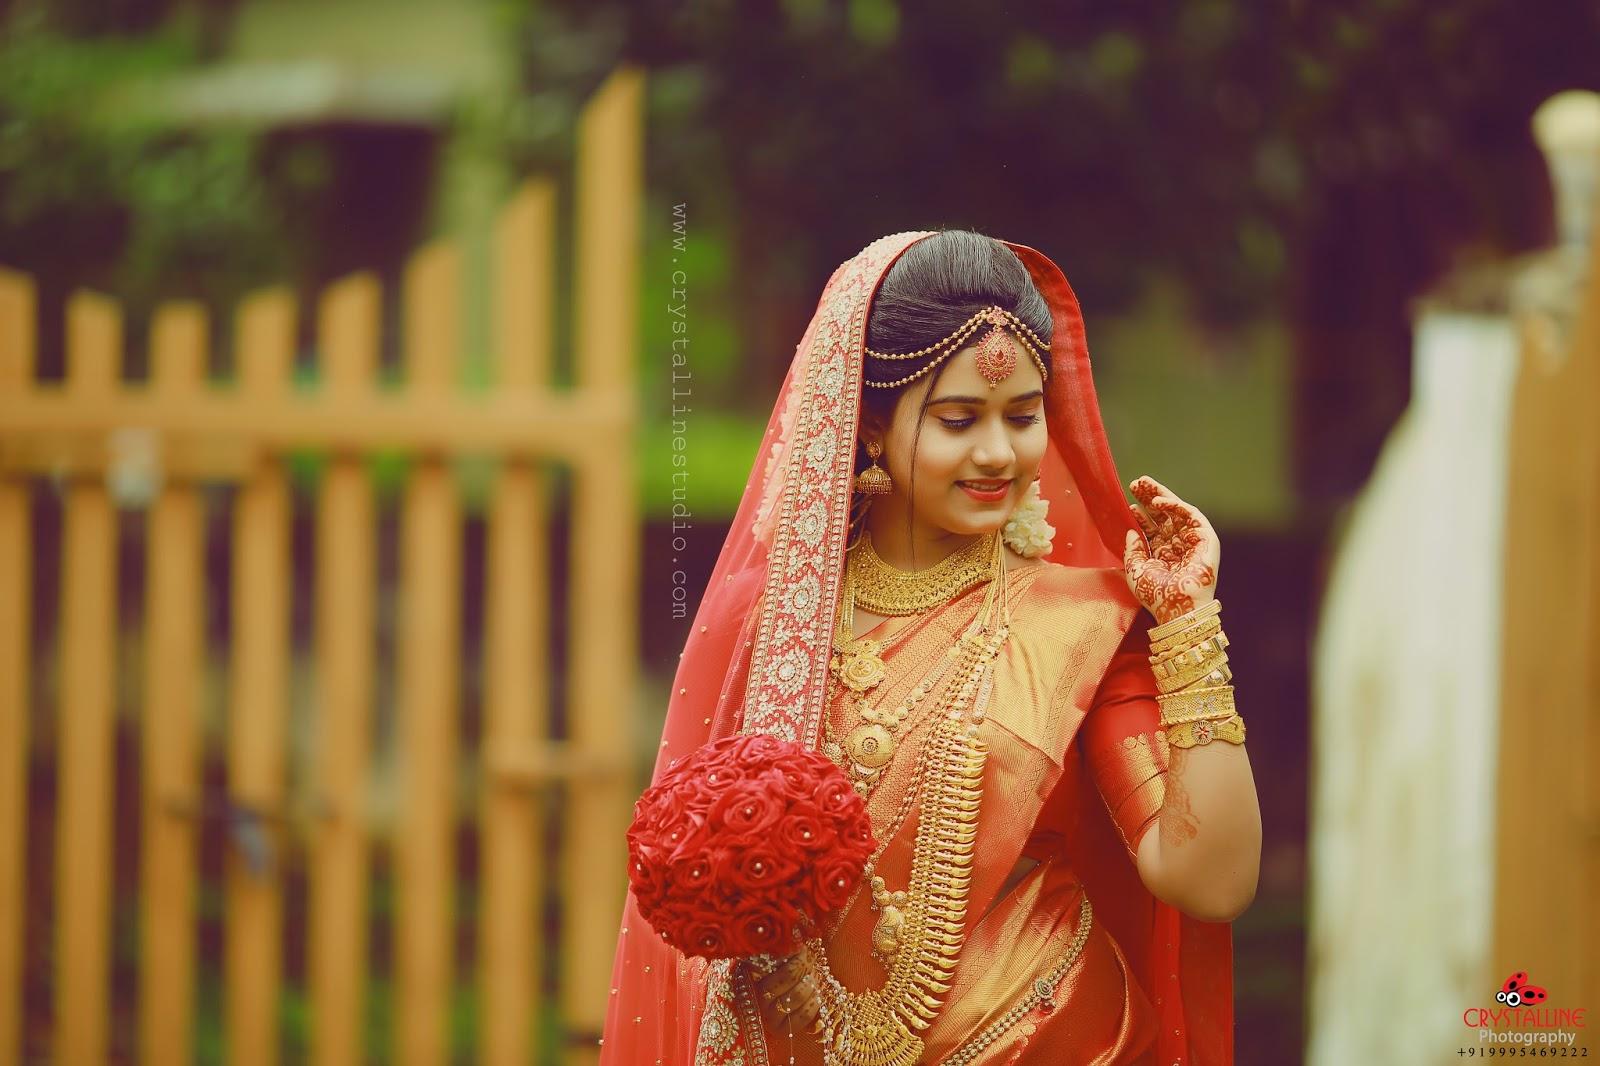 Kerala wedding photos muslim wedding photos wedding kerala wedding - Crystalline Studio Crystalline Photography Kerala Wedding Muslim Wedding